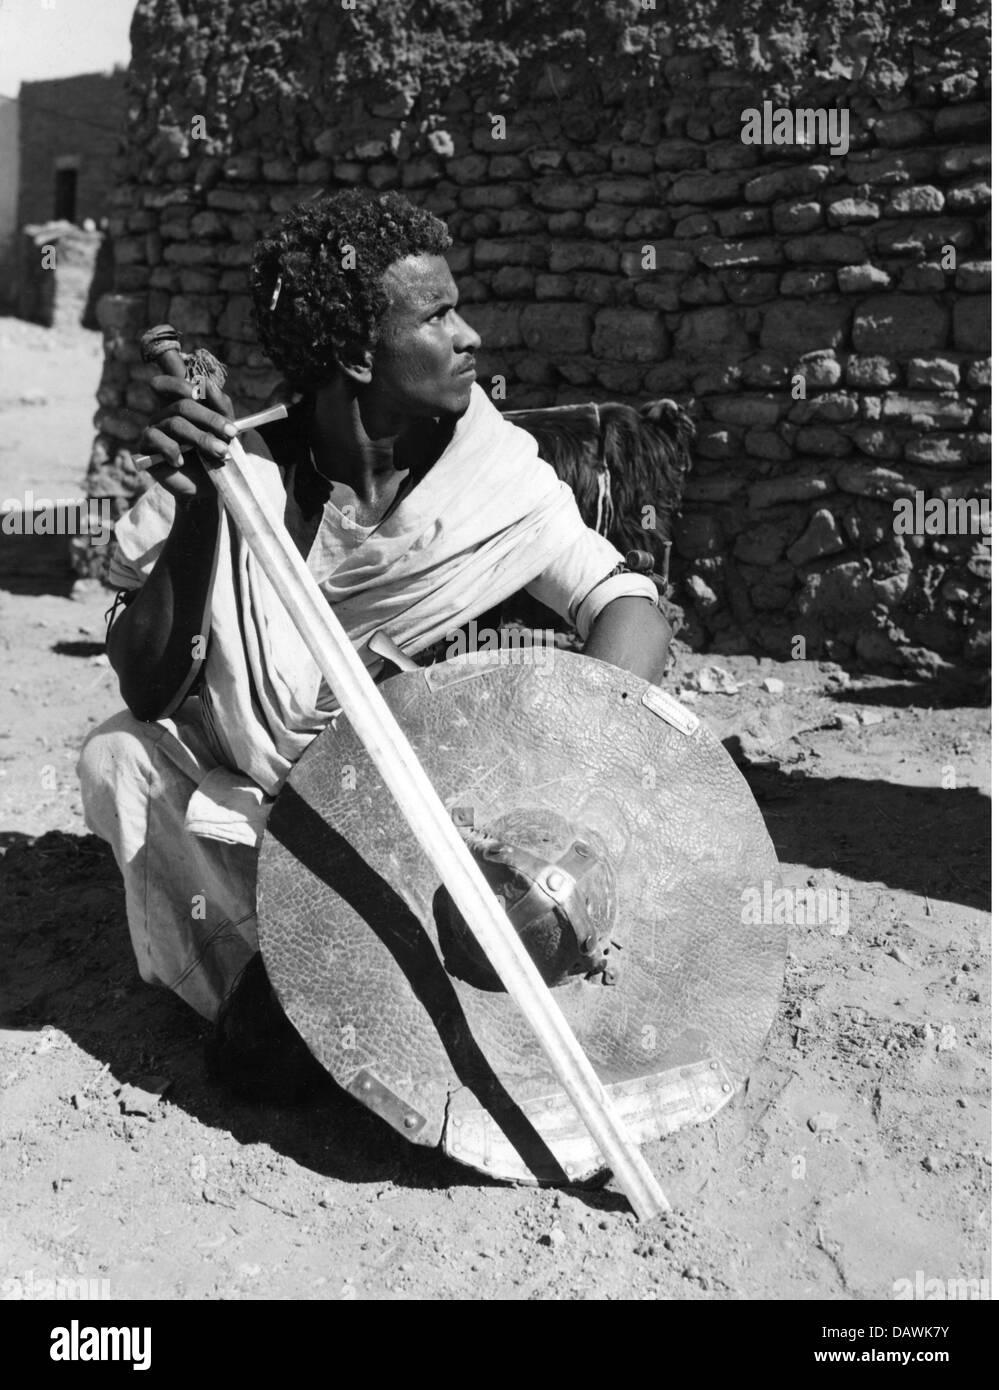 people warrior shield warrior sword stock photos people warrior geography travel people bishari warrior shield and sword near aswan